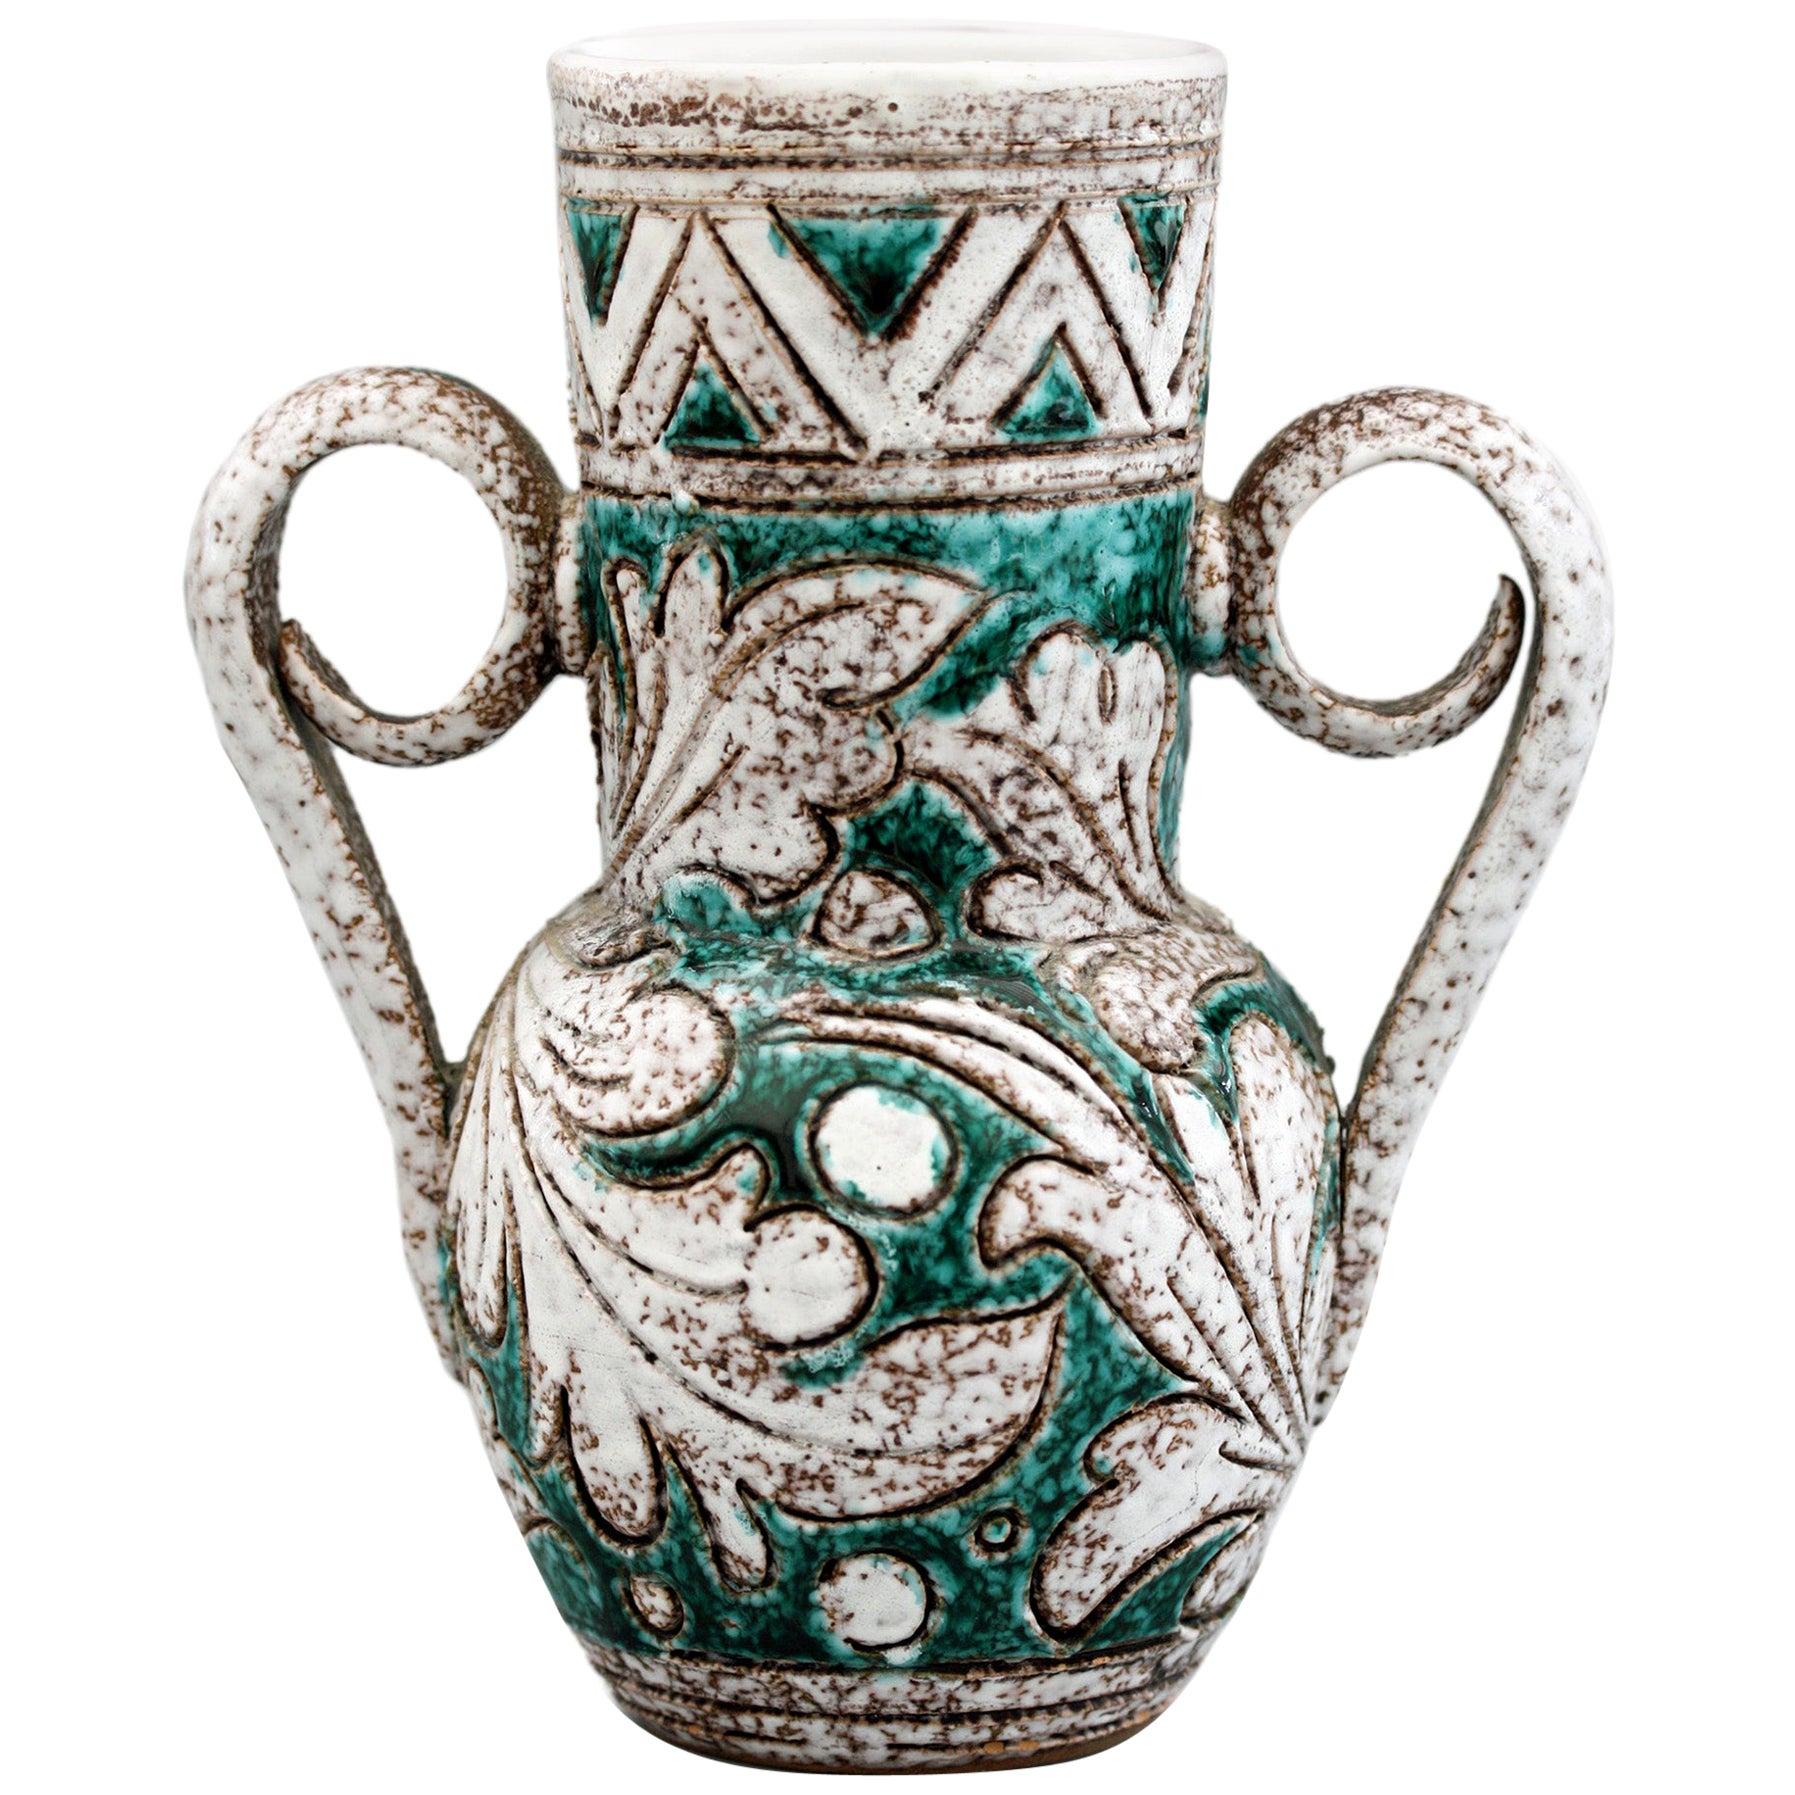 Italian Fratelli Fanciullacci Attributed Mid Century Art Pottery Sgraffito Vase